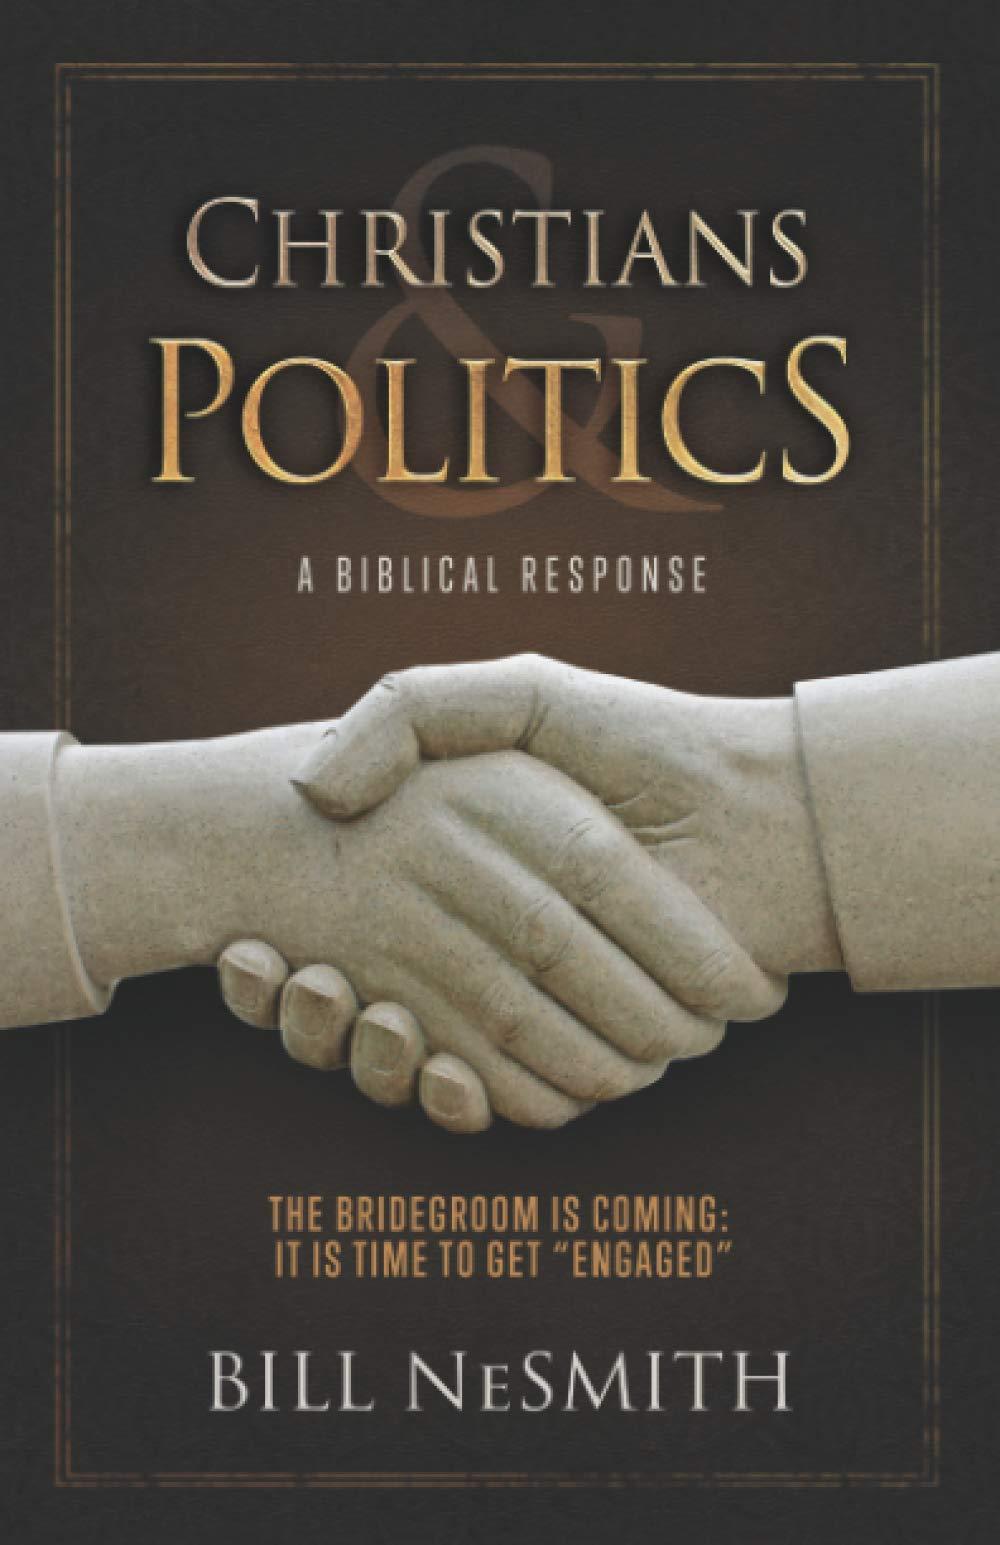 Christians & Politics: A Biblical Response